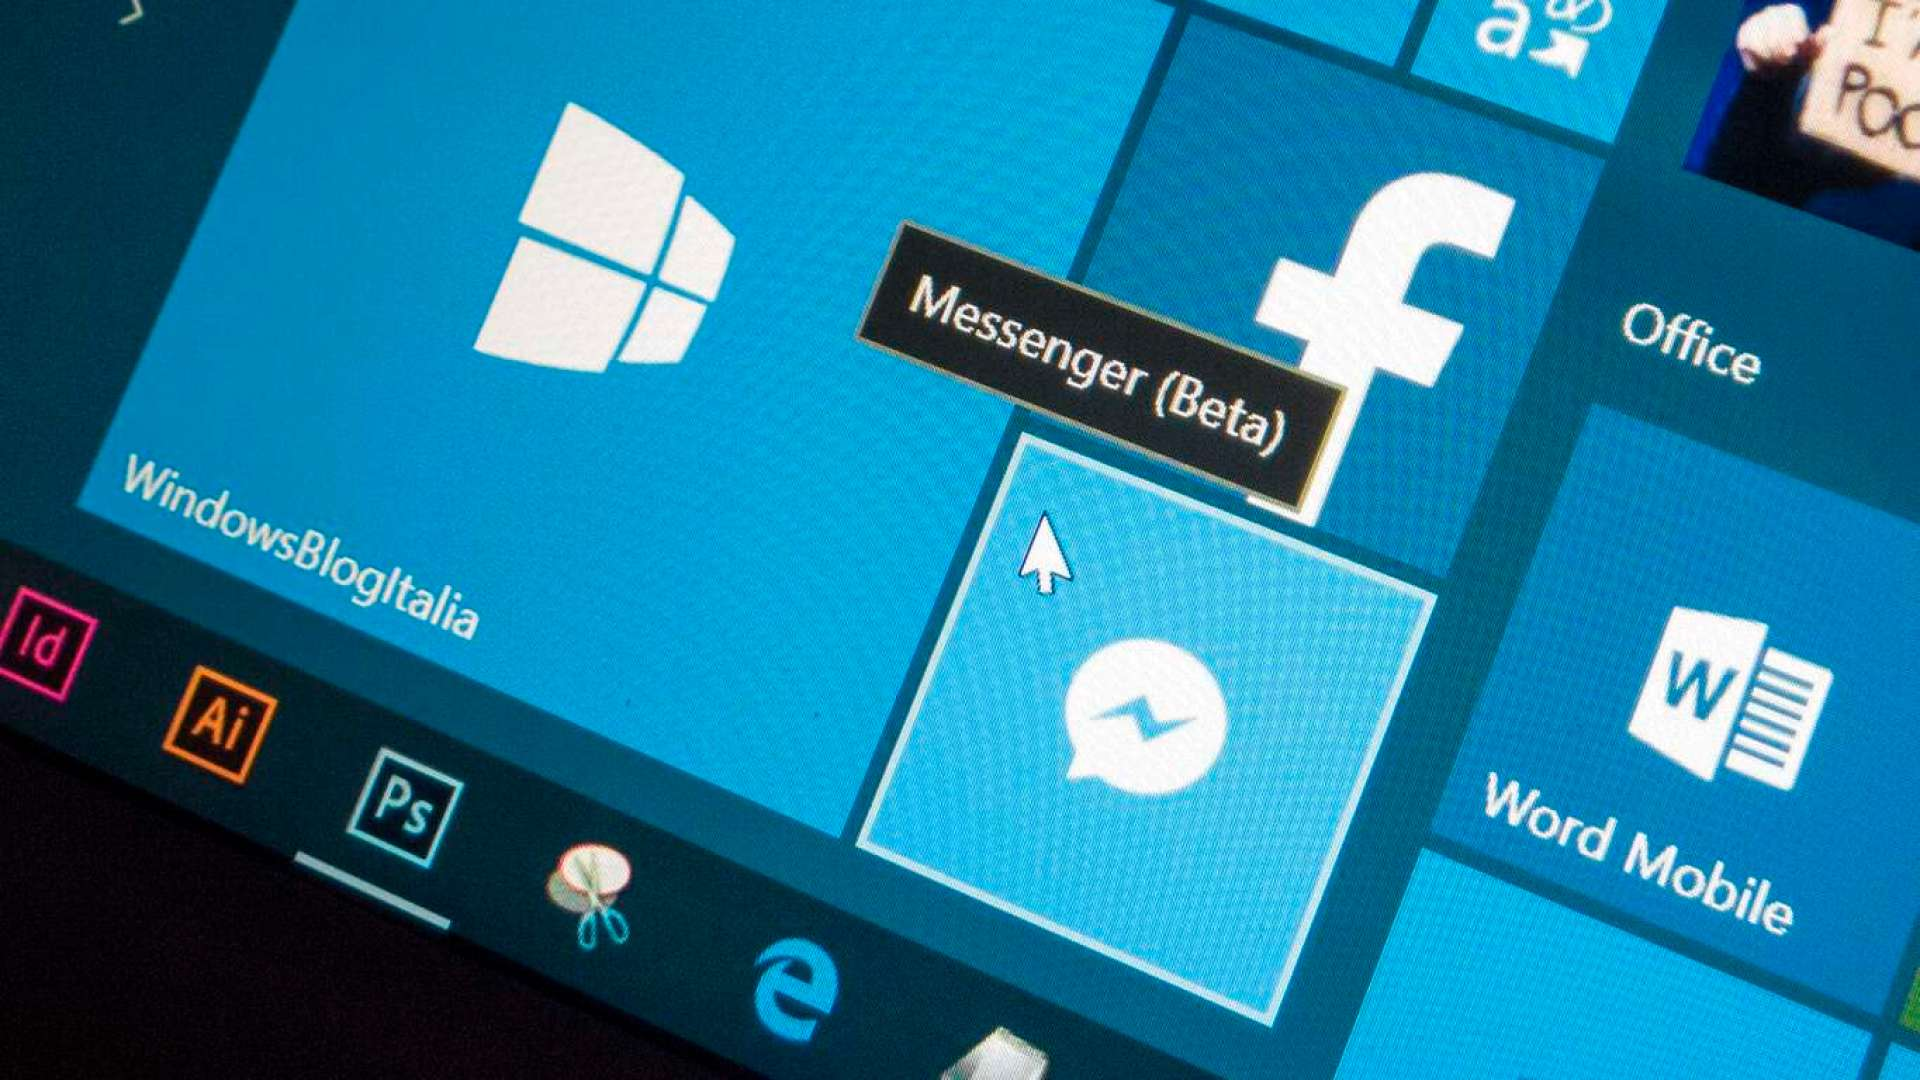 Facebook-Messenger-for-Windows-10